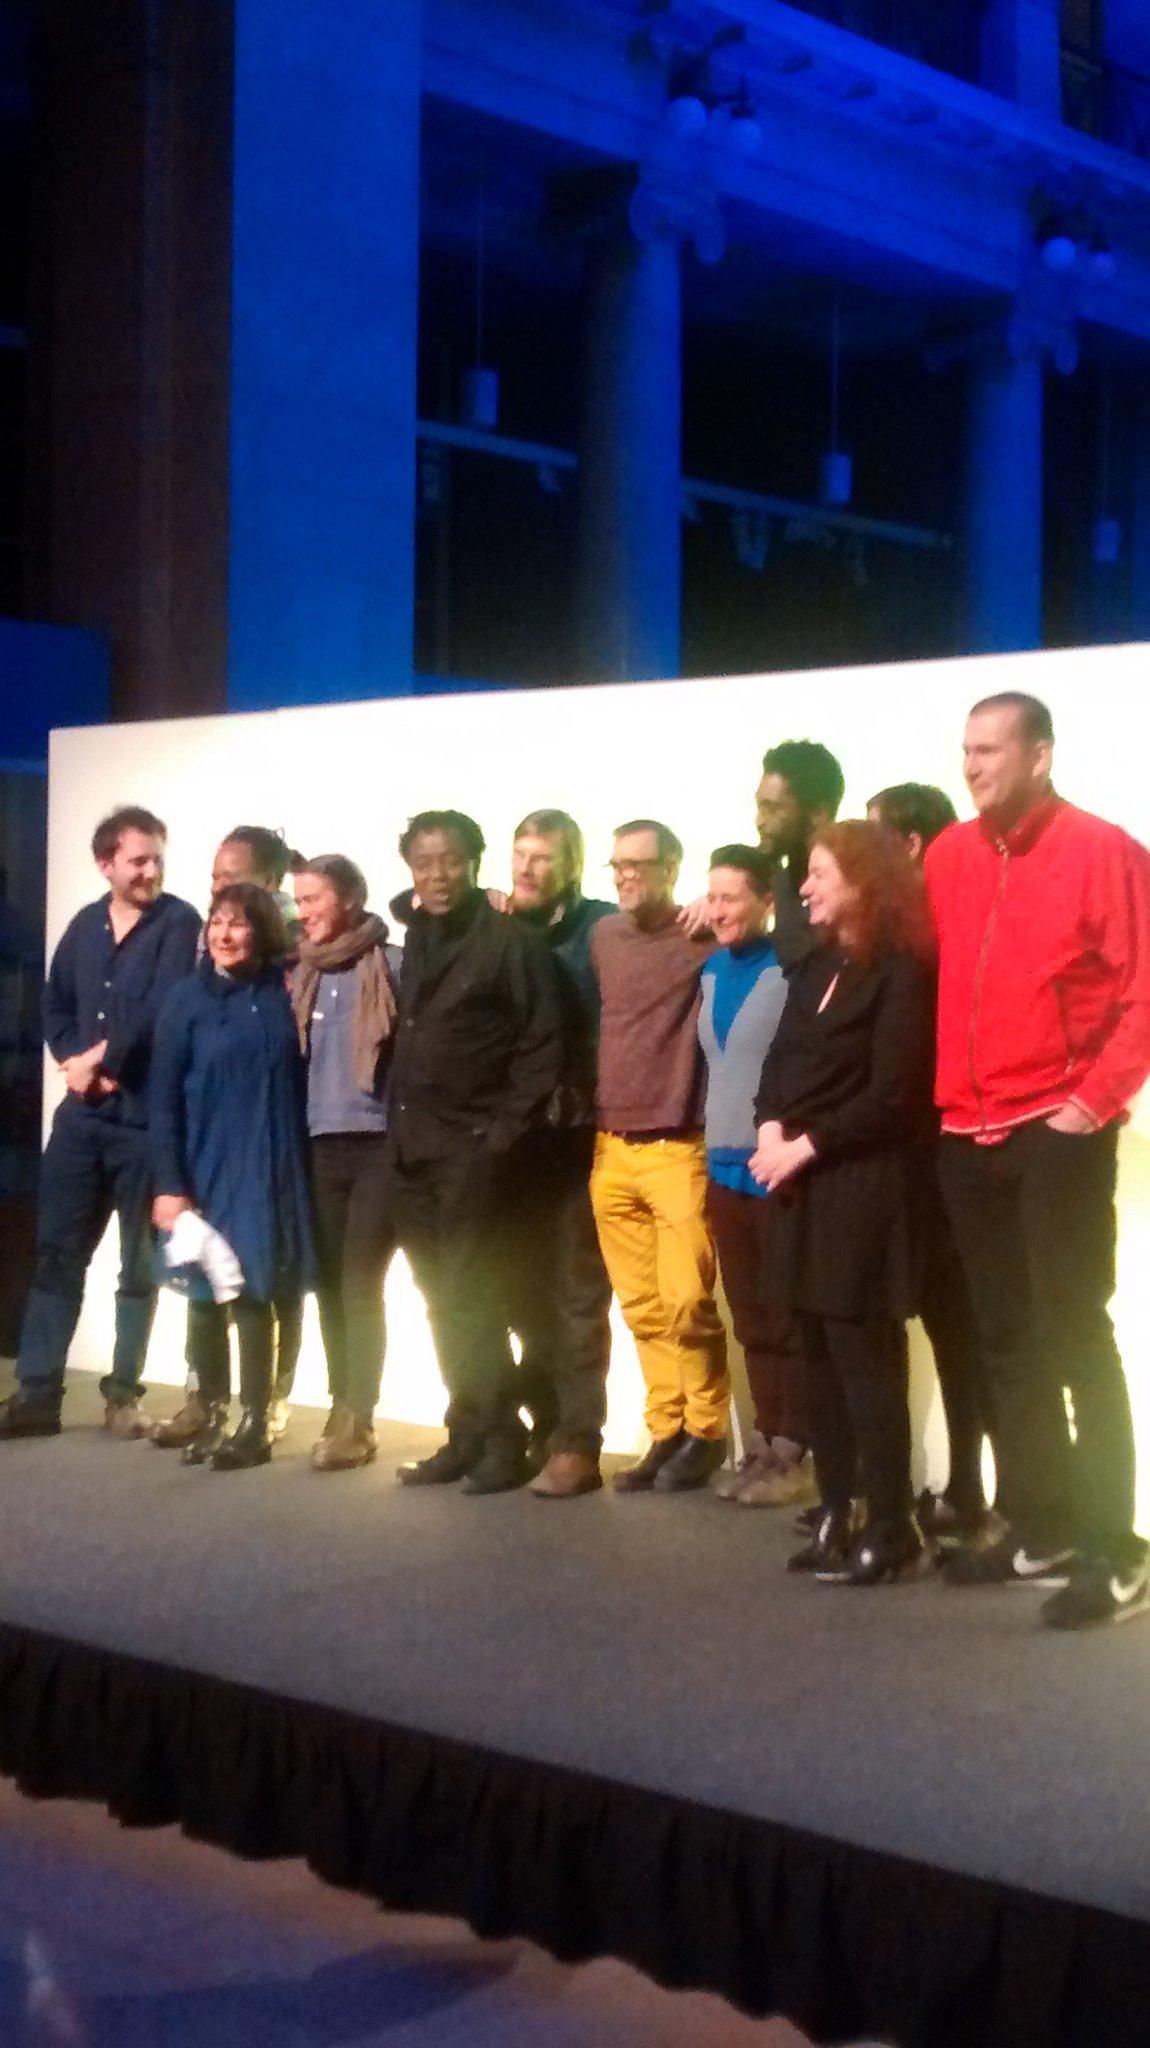 Huge congratulations to John Akomfrah winner of @ArtesMundi  and Bedwyr Williams winner of Derek Williams Purchase award. https://t.co/q8ssVBva4f